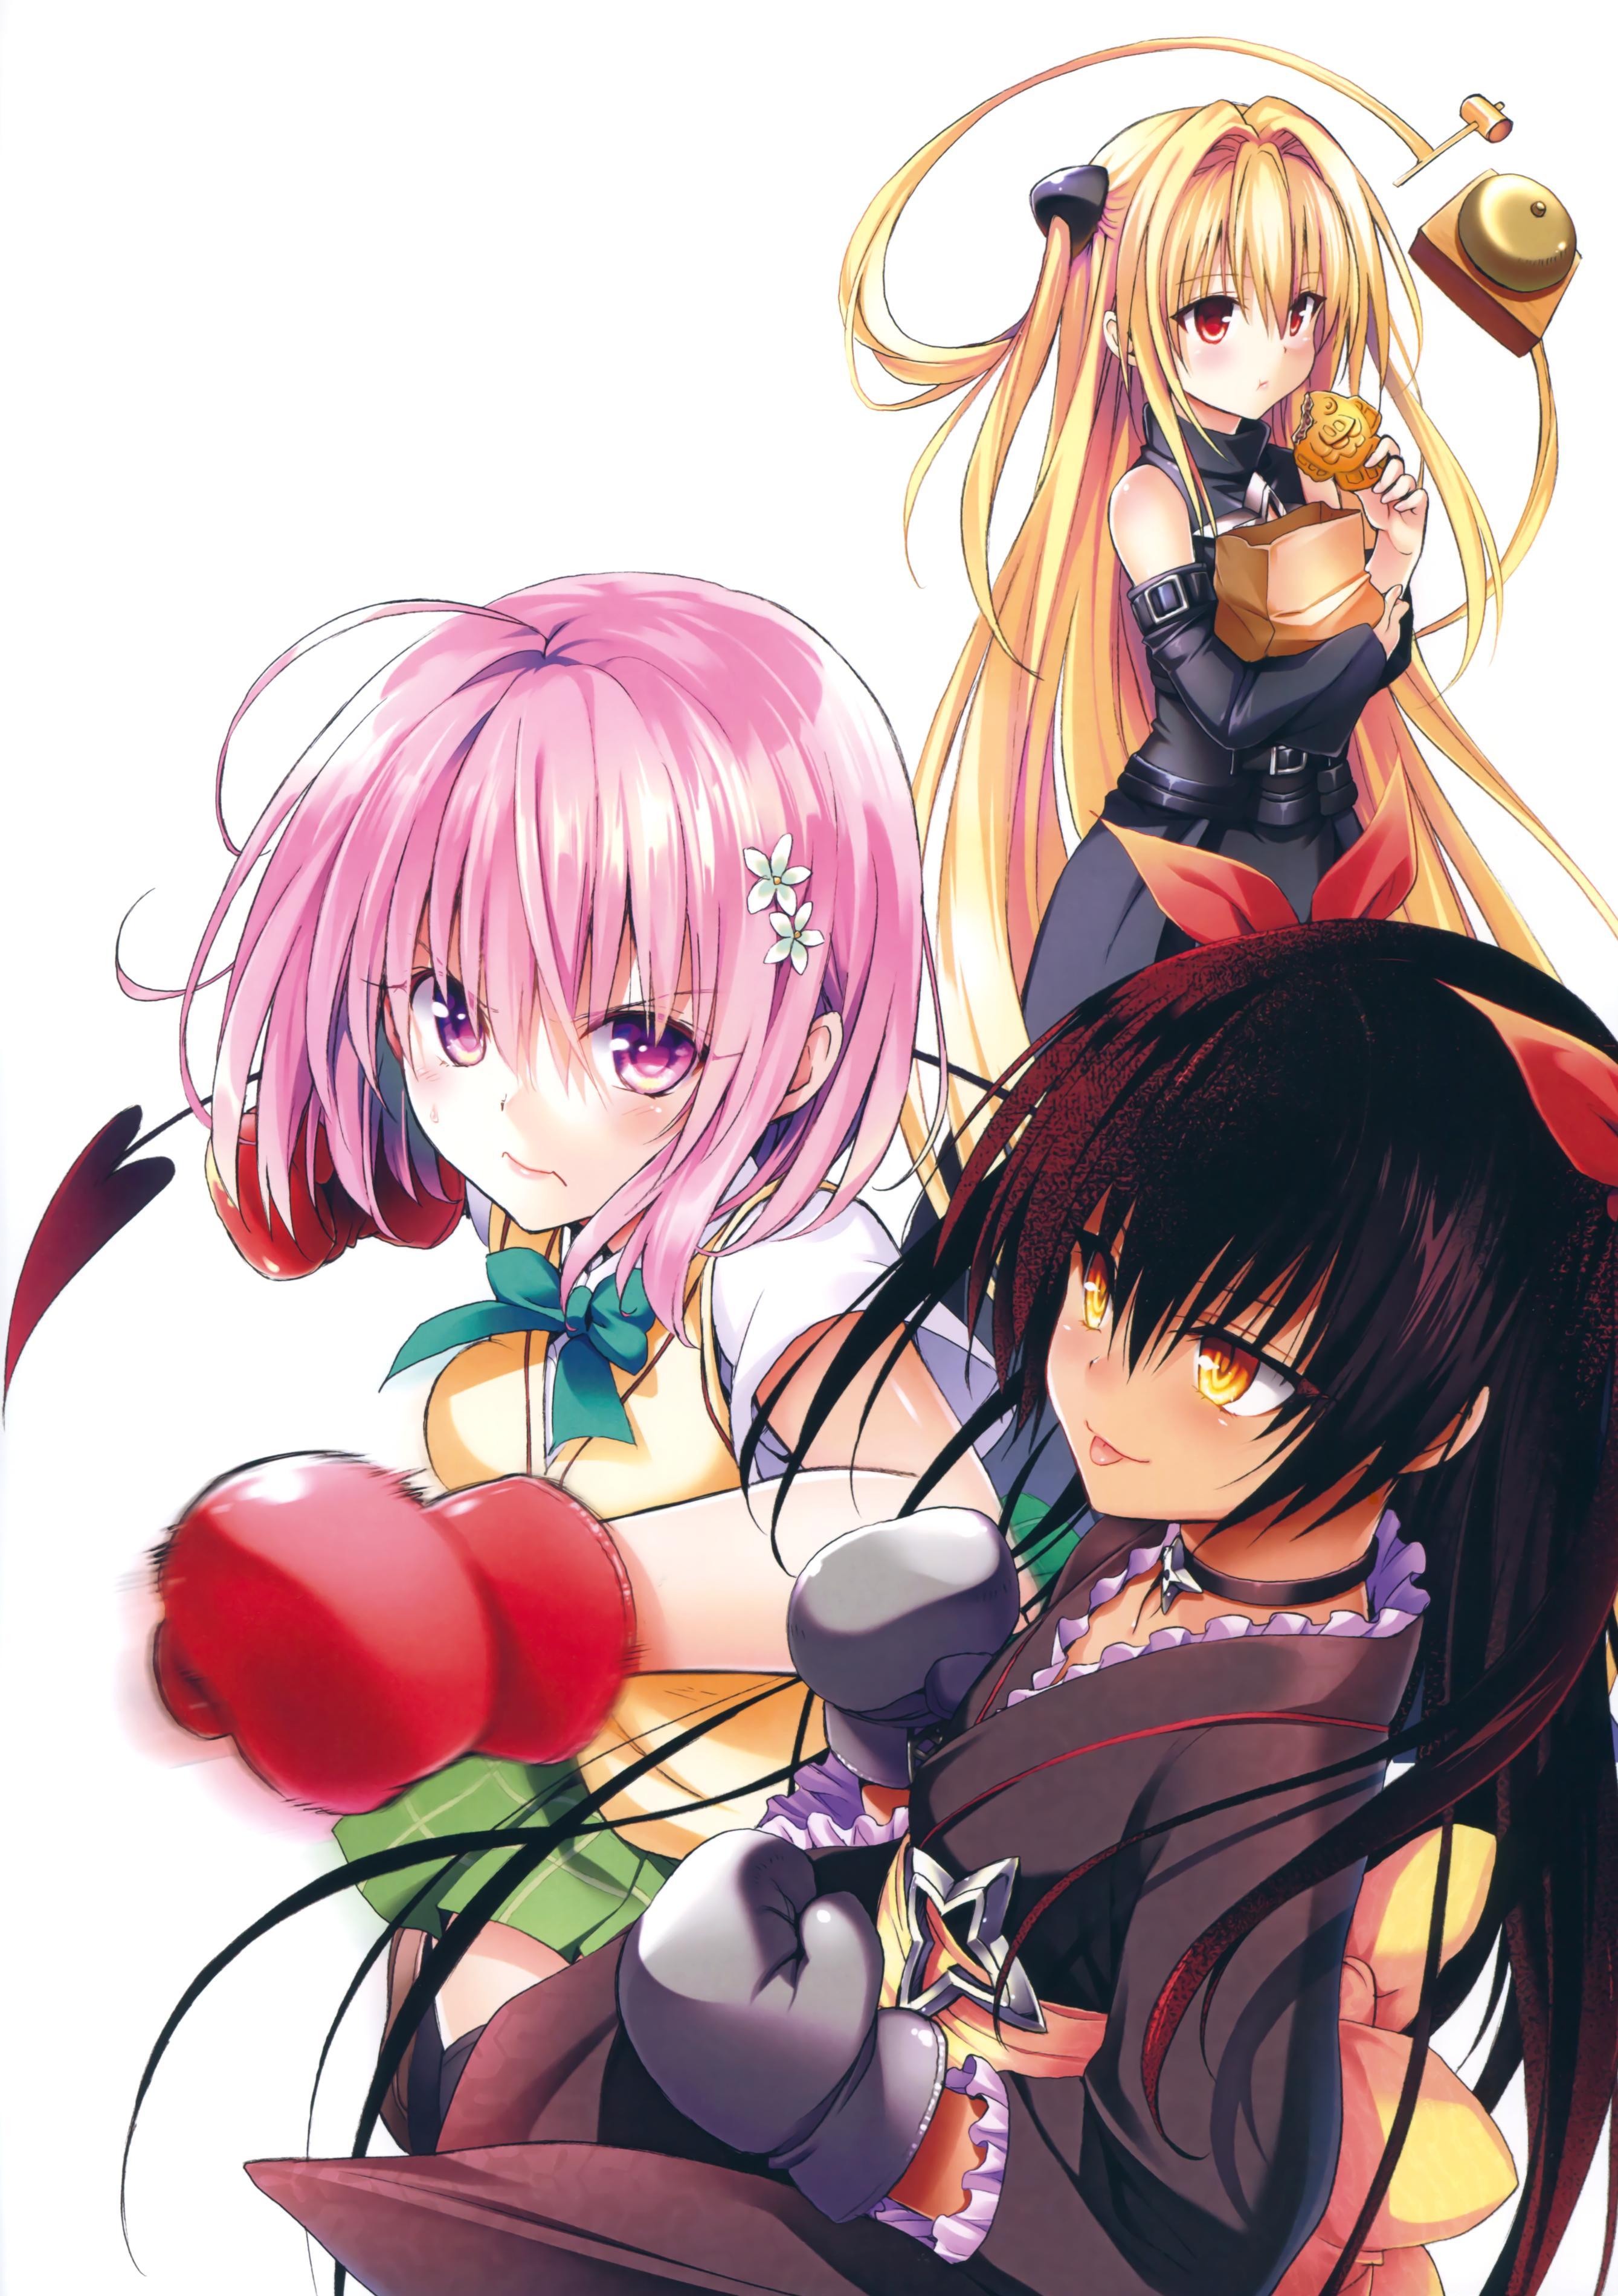 [Yabuki Kentaro] To Love-Ru -Trouble- Darkness Artbook Harem Gold 73